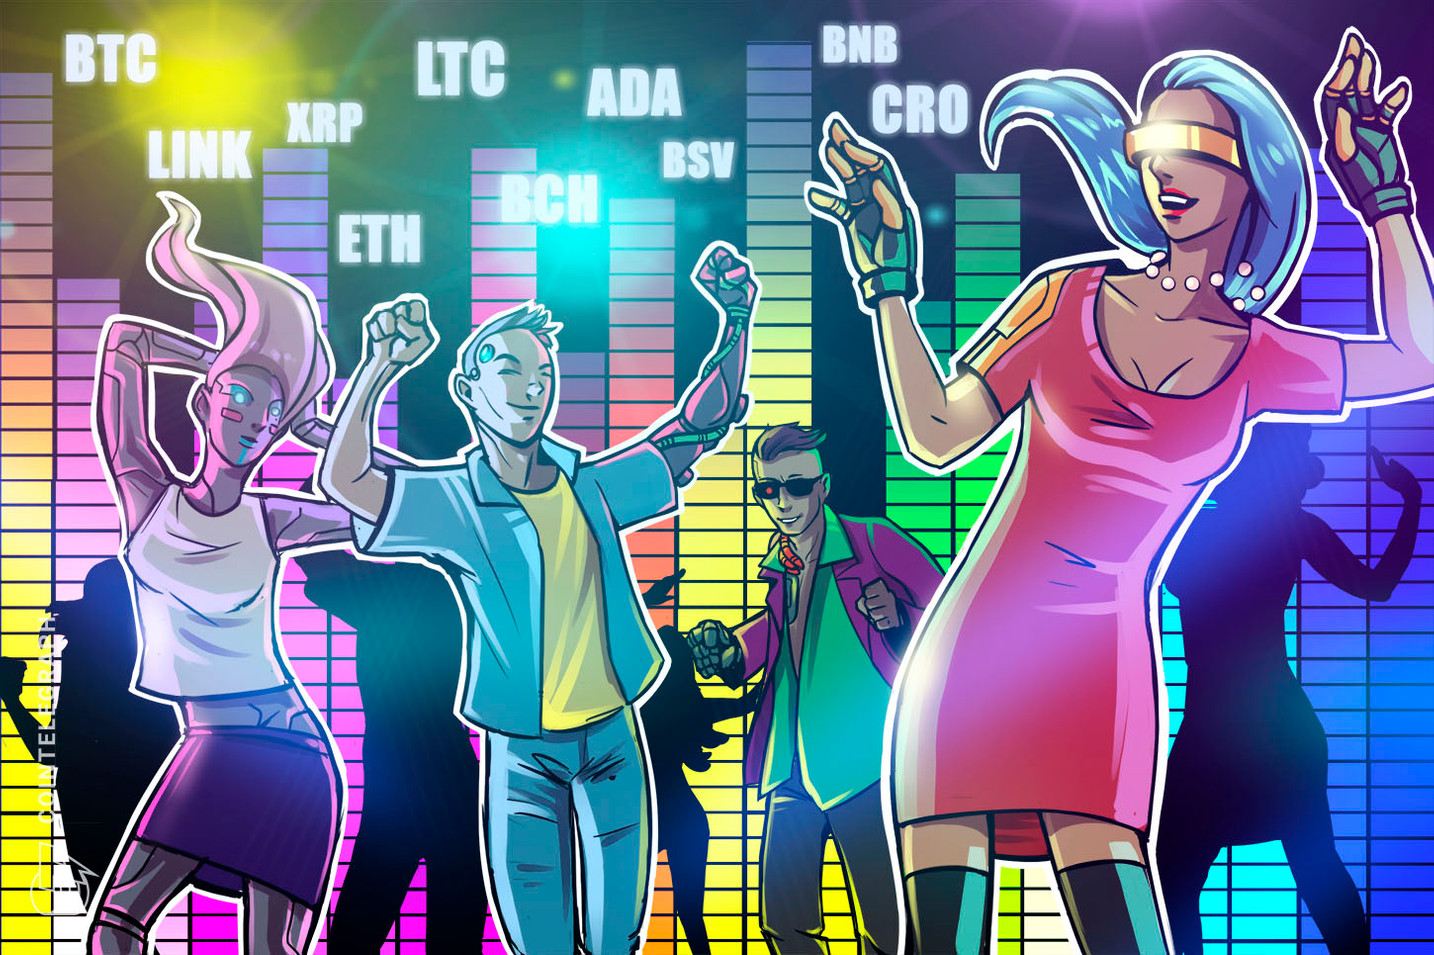 Price Analysis 8/21: BTC, ETH, XRP, BCH, LINK, LTC, BSV, ADA, BNB, CRO